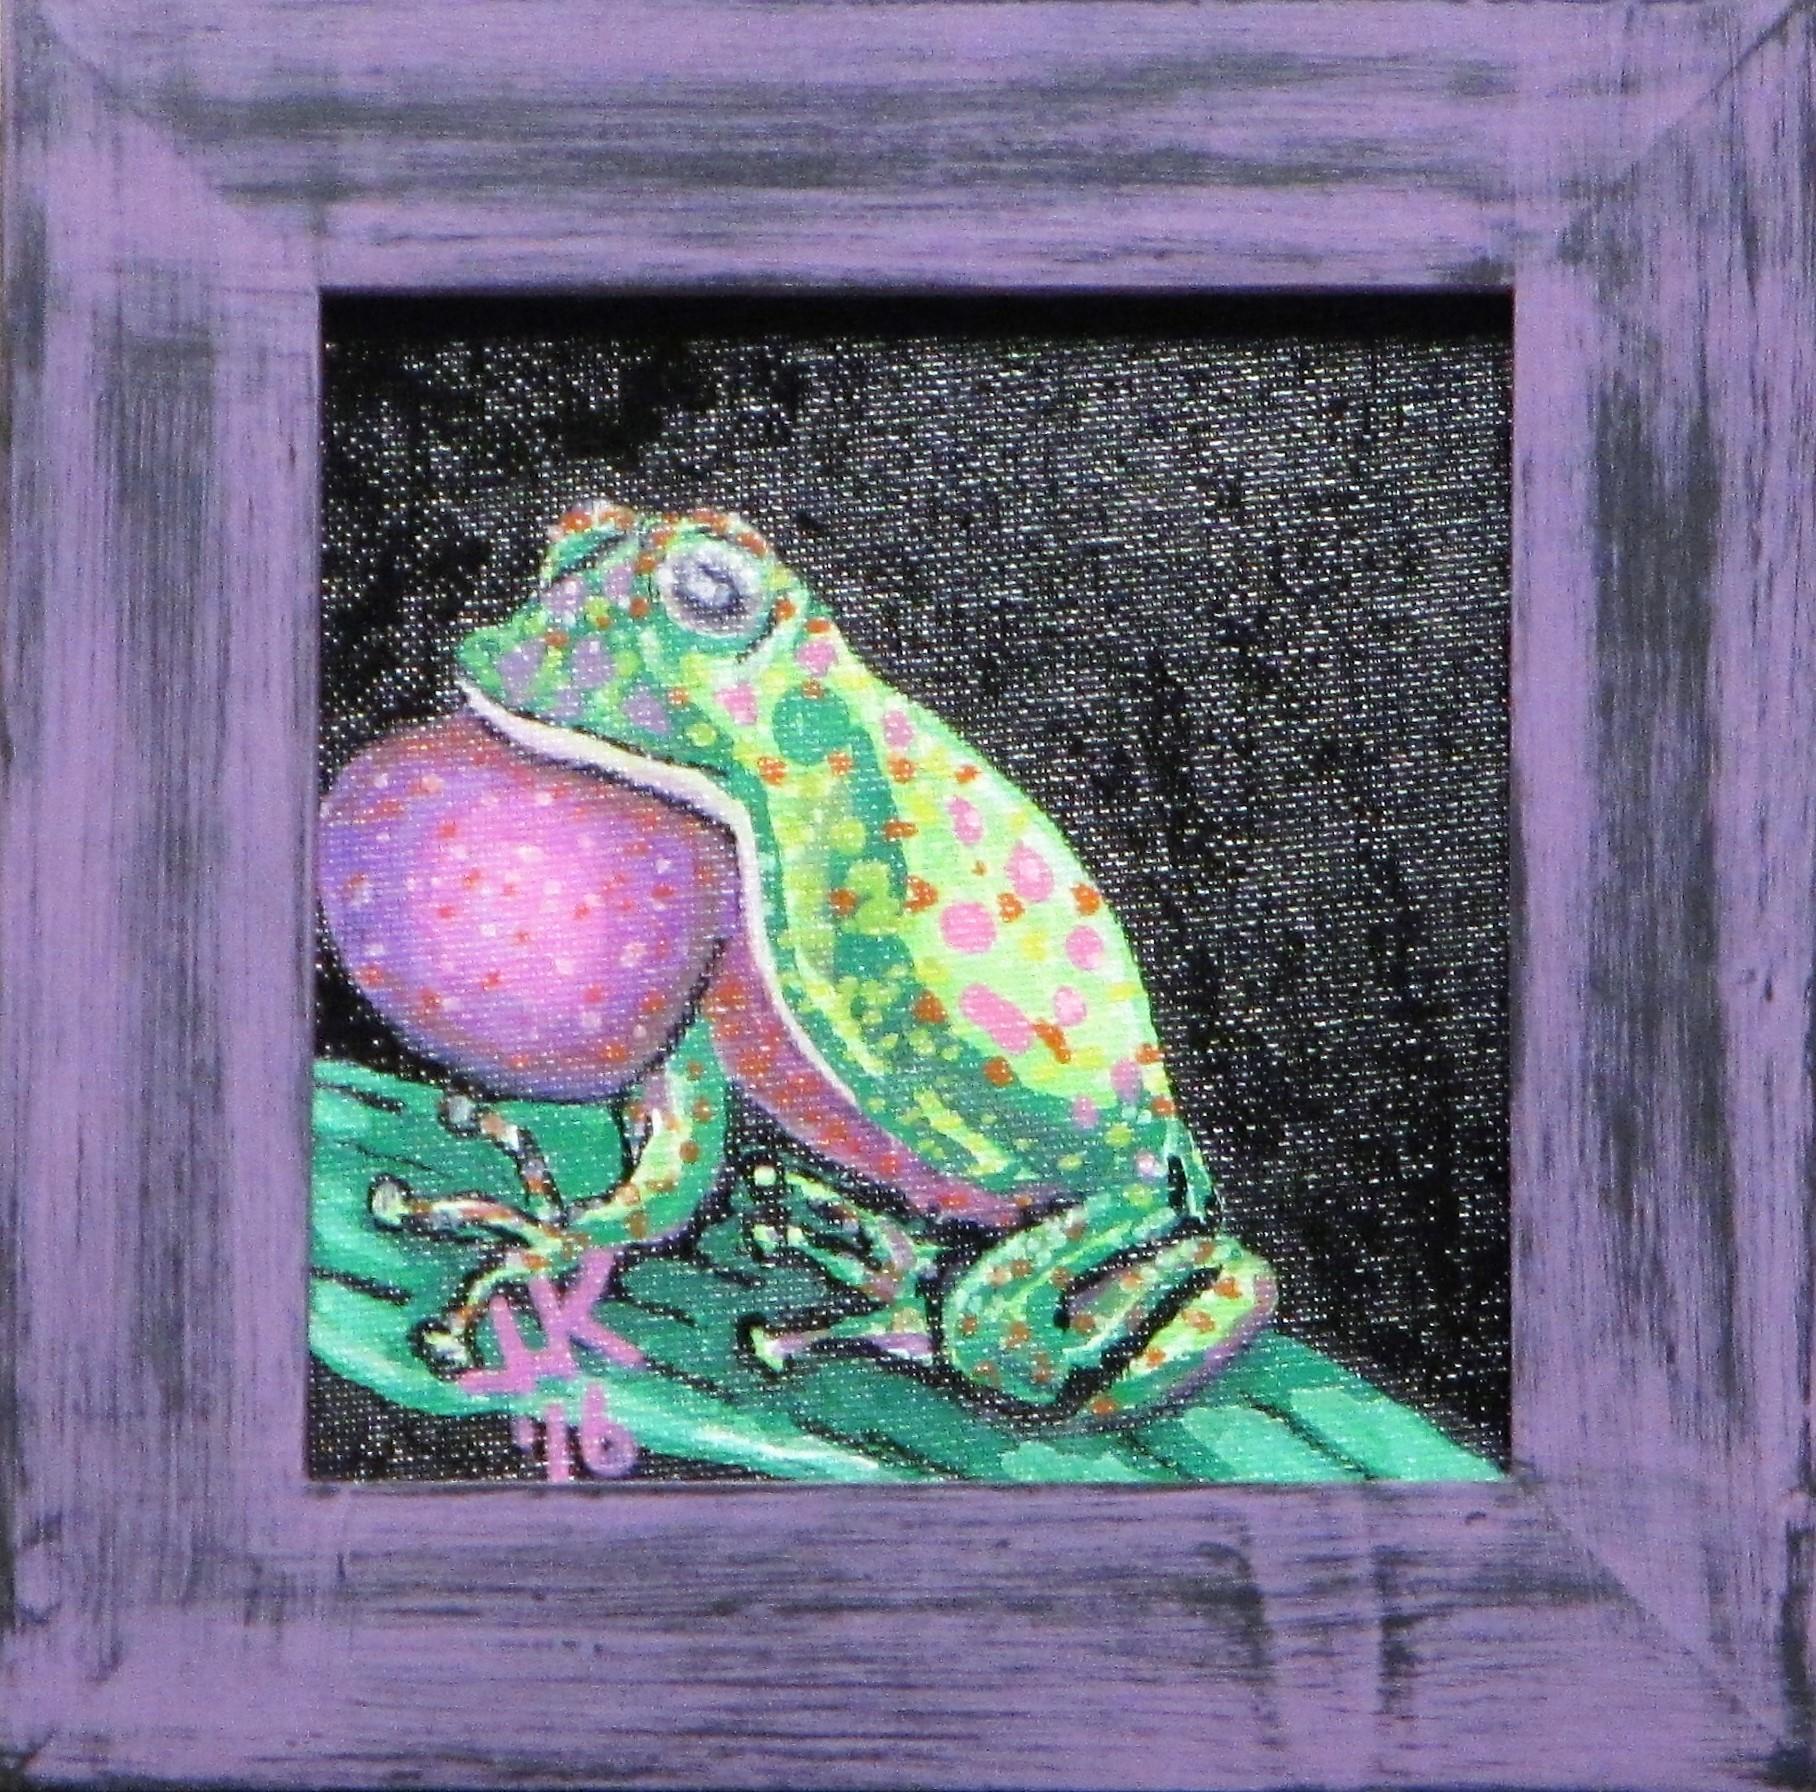 A green & purple tree frog.